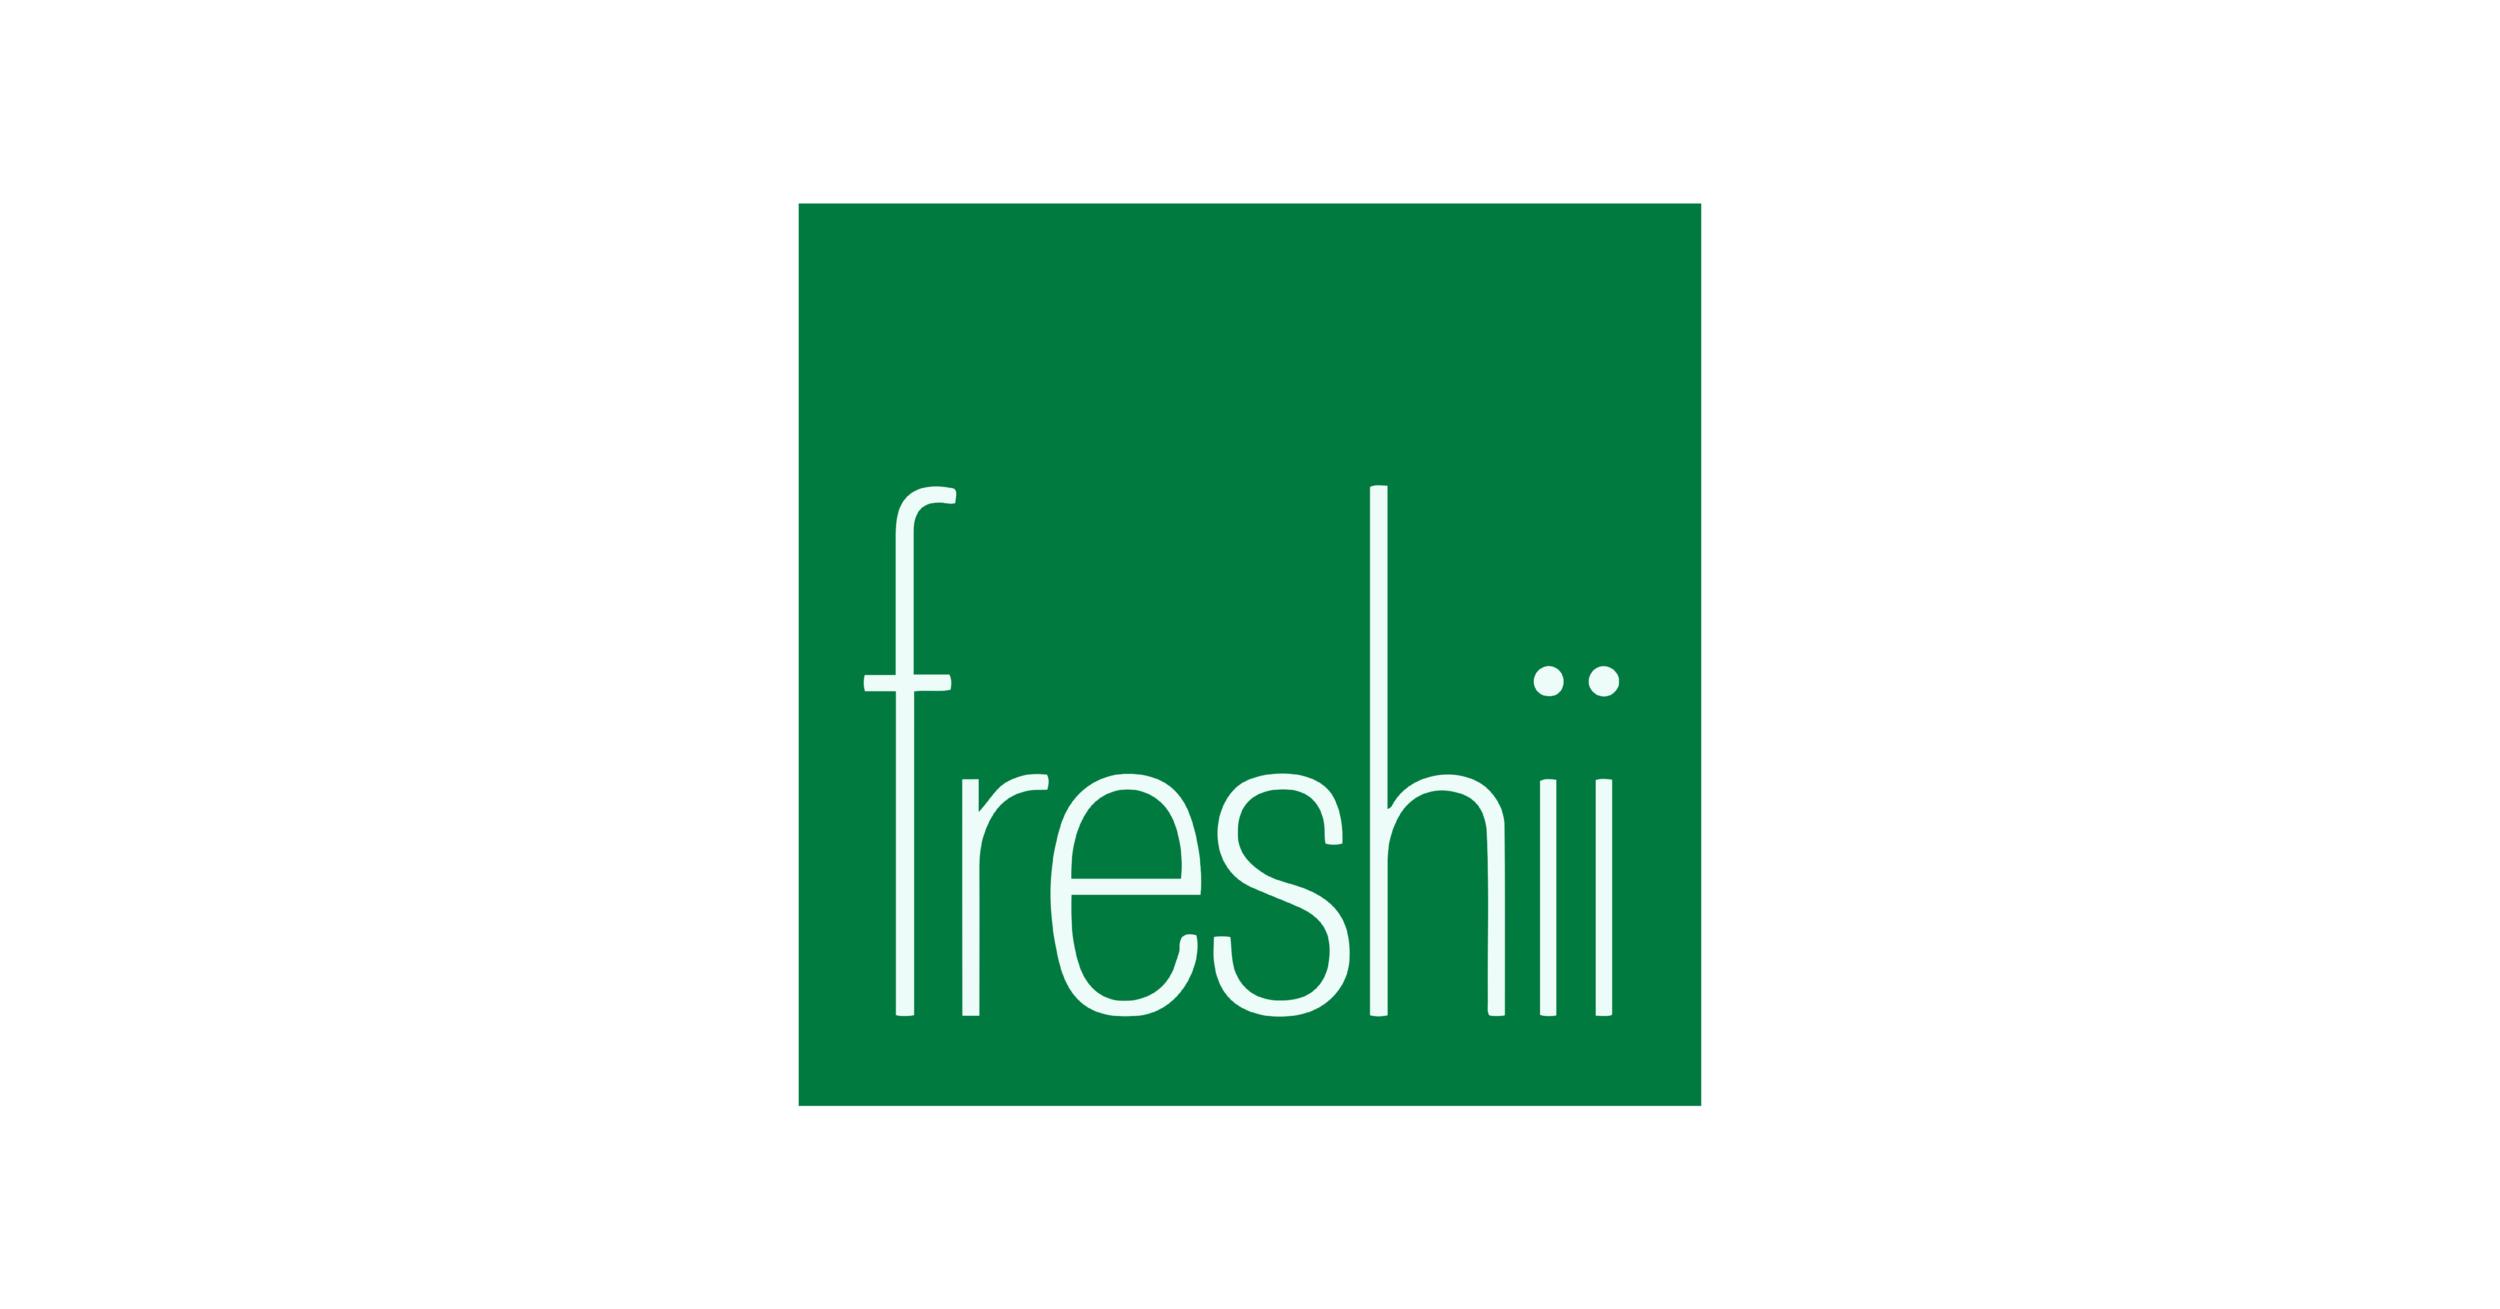 Plant-based tips for eating at Freshii. Vegan menu options for Freshii explained.